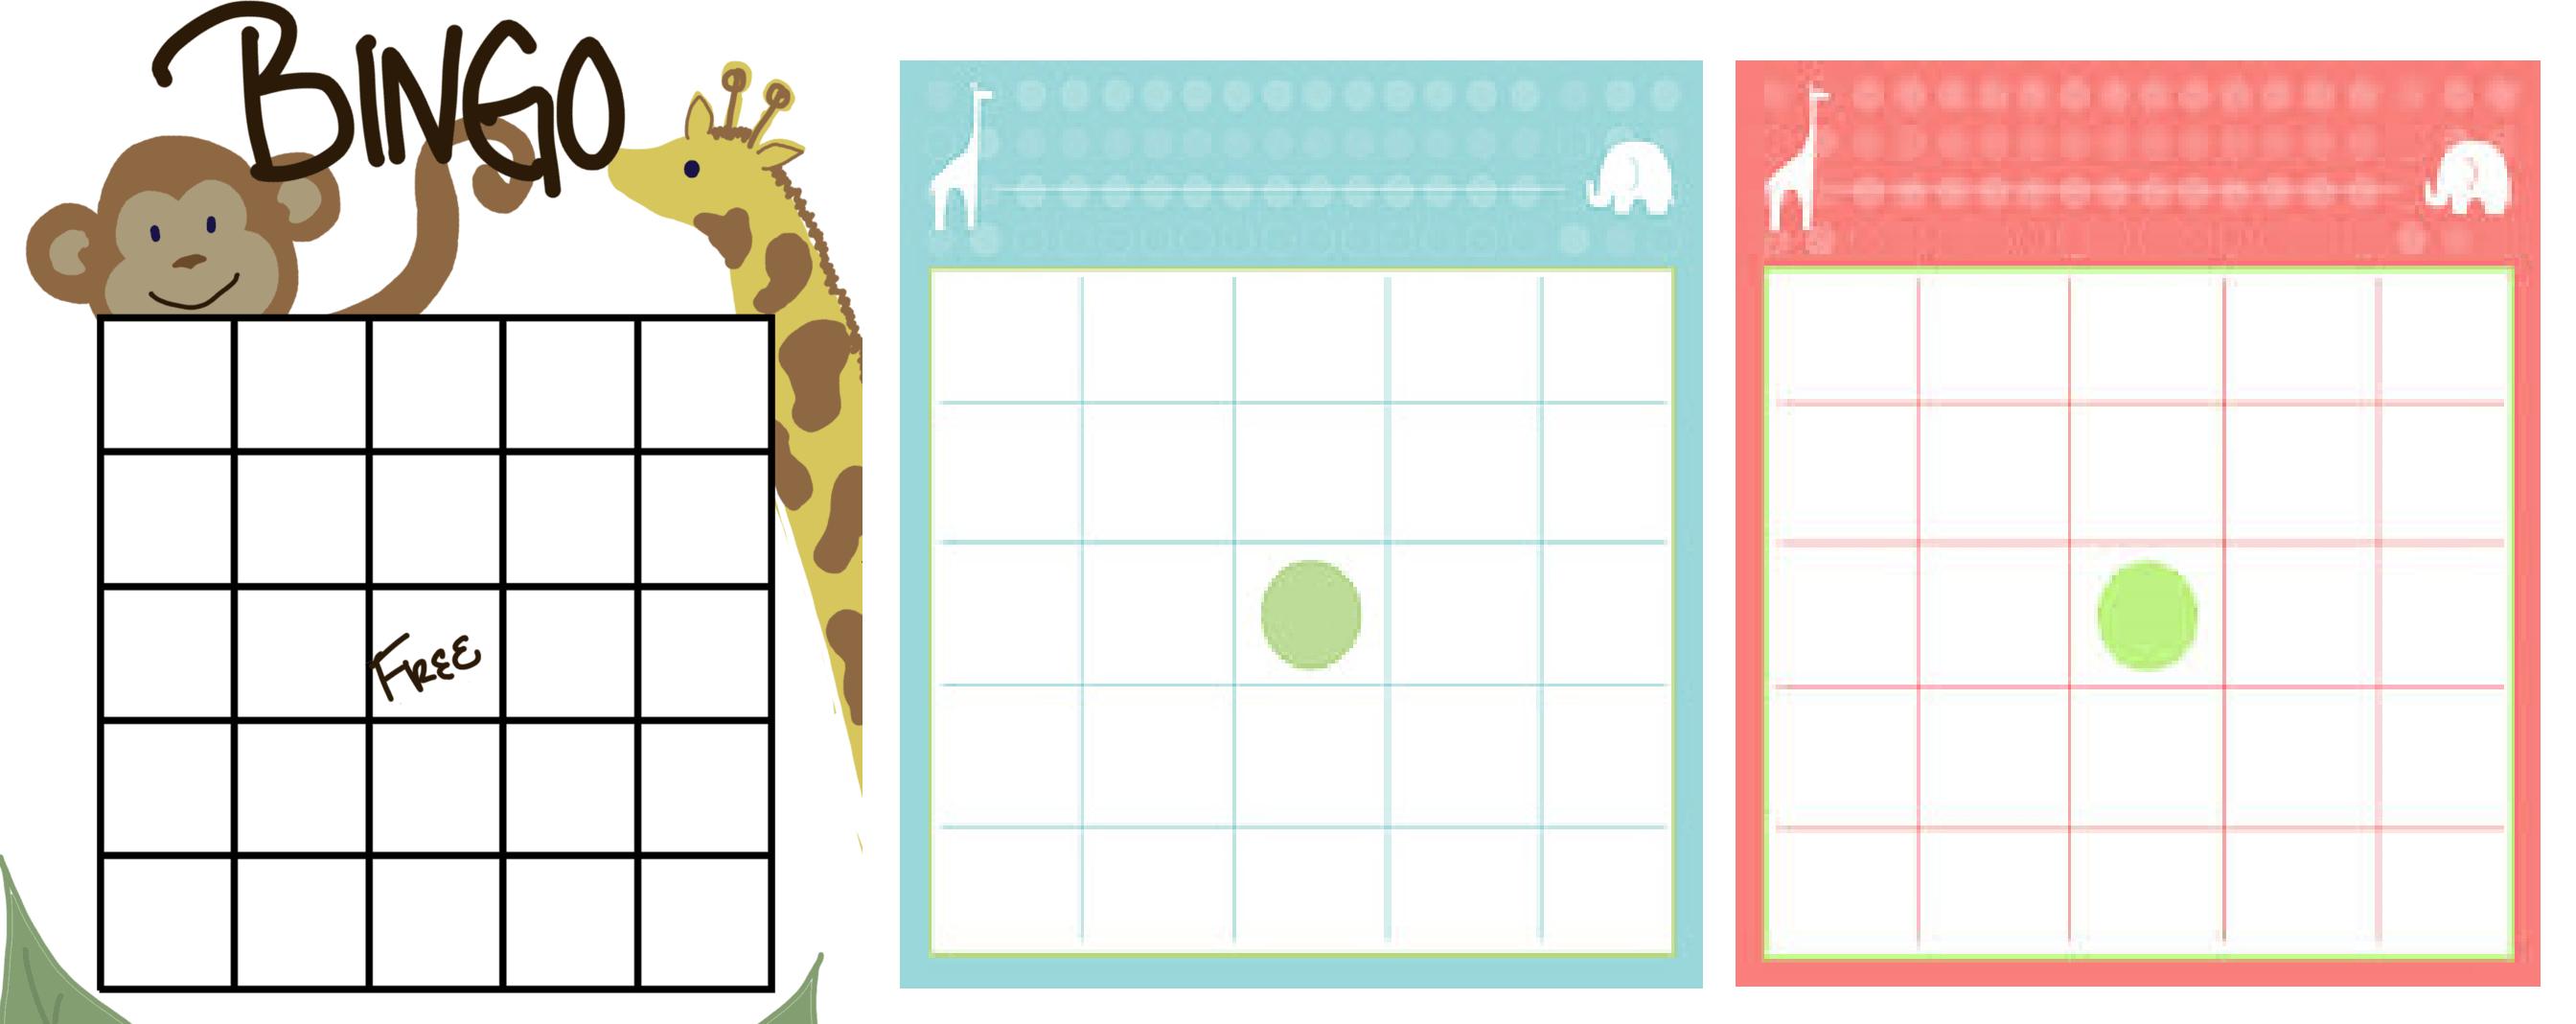 BINGO PARA CHÁ DE BEBÊ: Cartelas para Imprimir | Bingo cha de bebe, Bingo,  Brincadeiras para chá de bebê